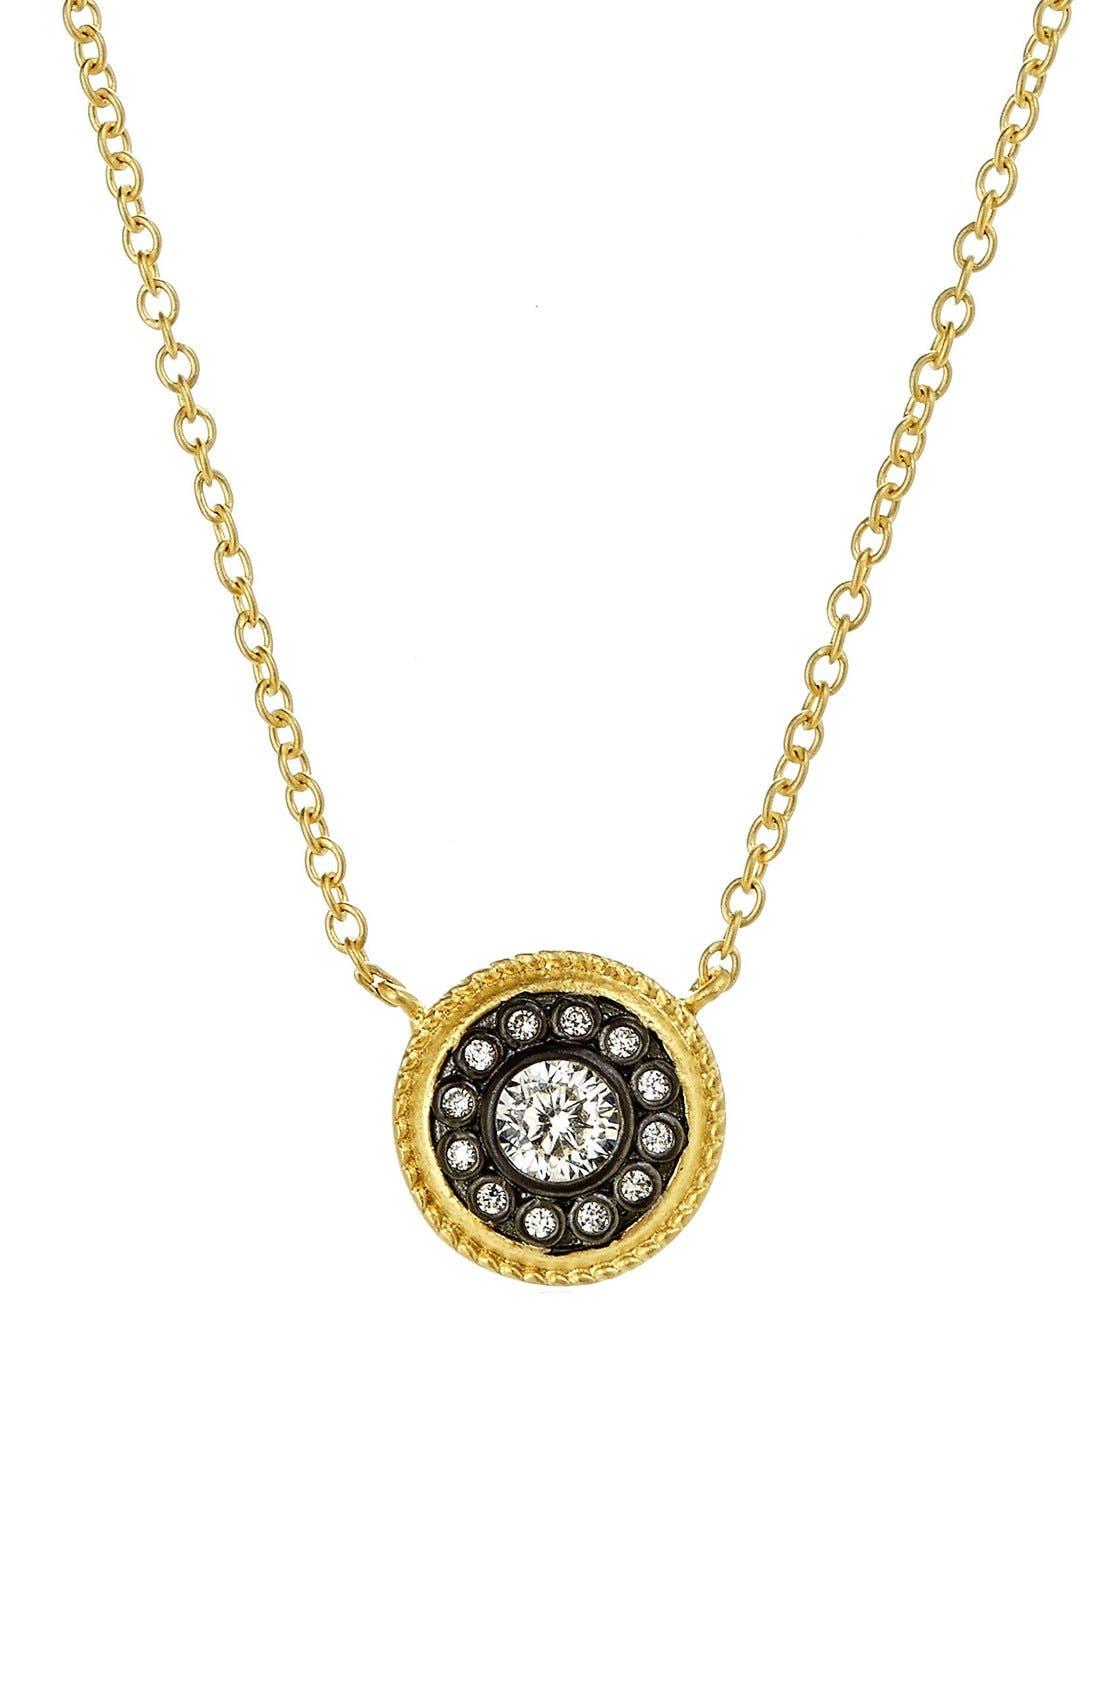 'Hamptons' Nautical Button Pendant Necklace,                             Main thumbnail 1, color,                             GOLD/ GUNMETAL